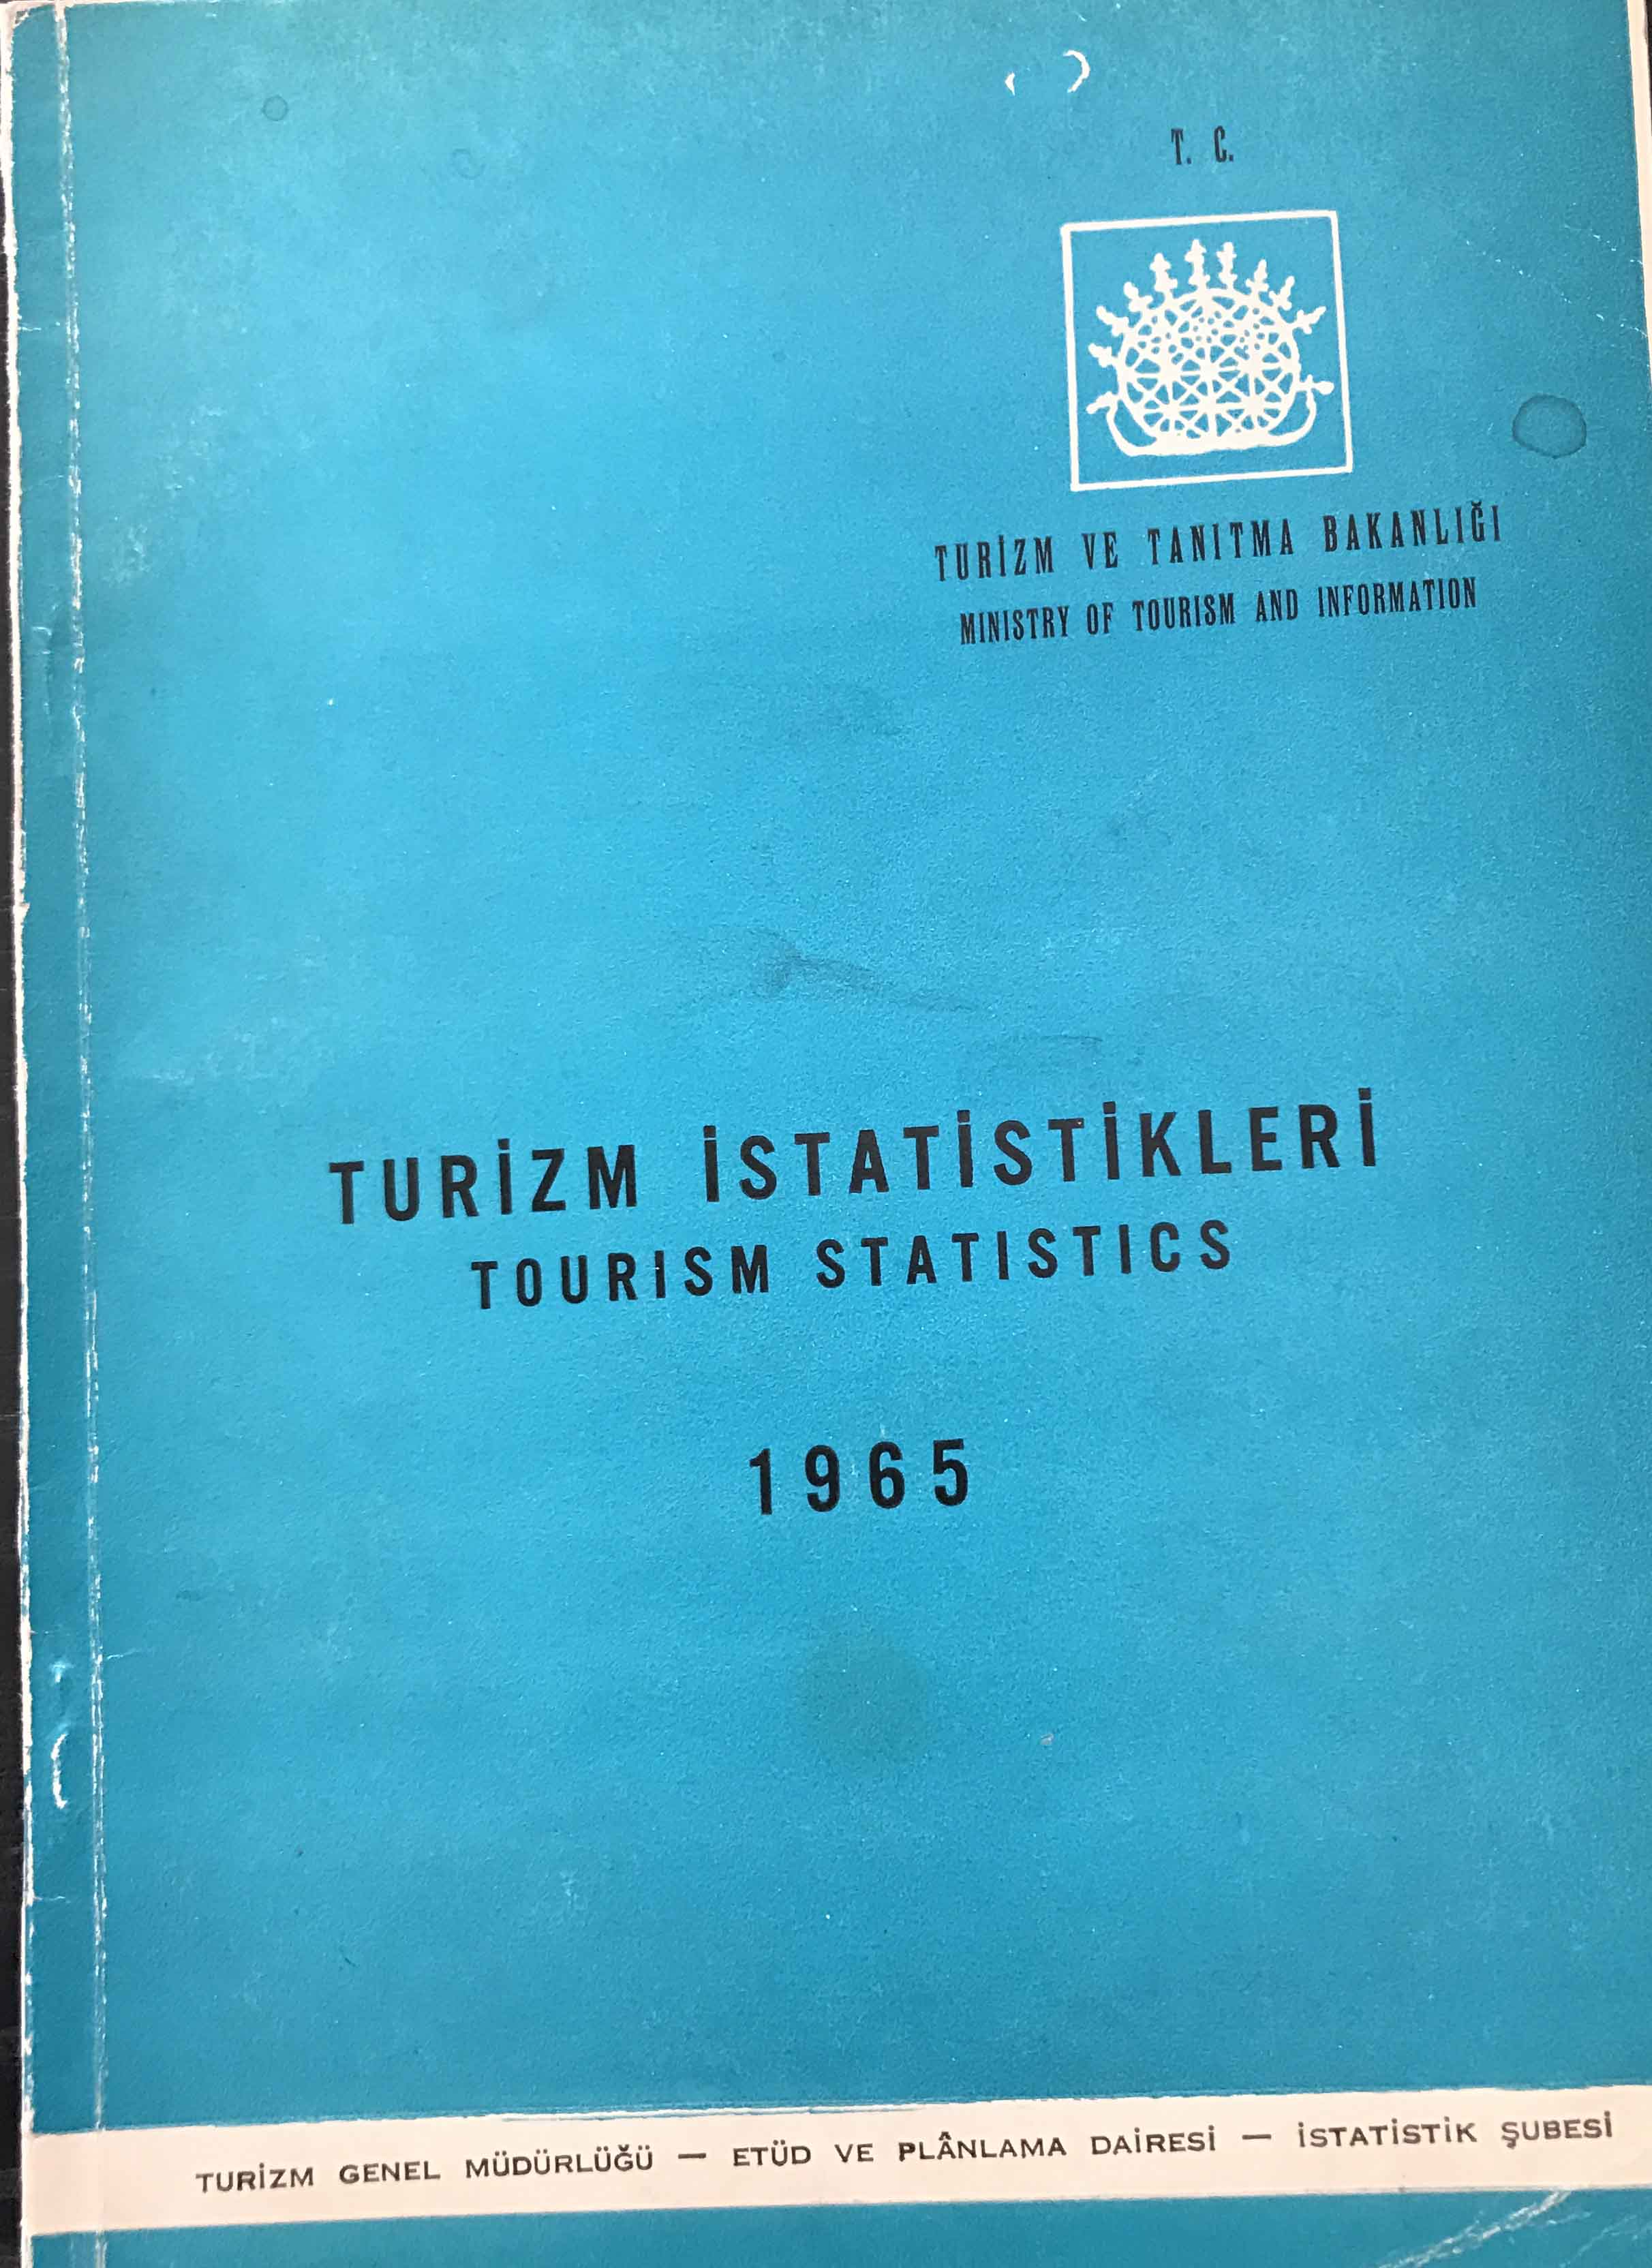 Turizm İstatistikleri 1965 Kitap Kapağı